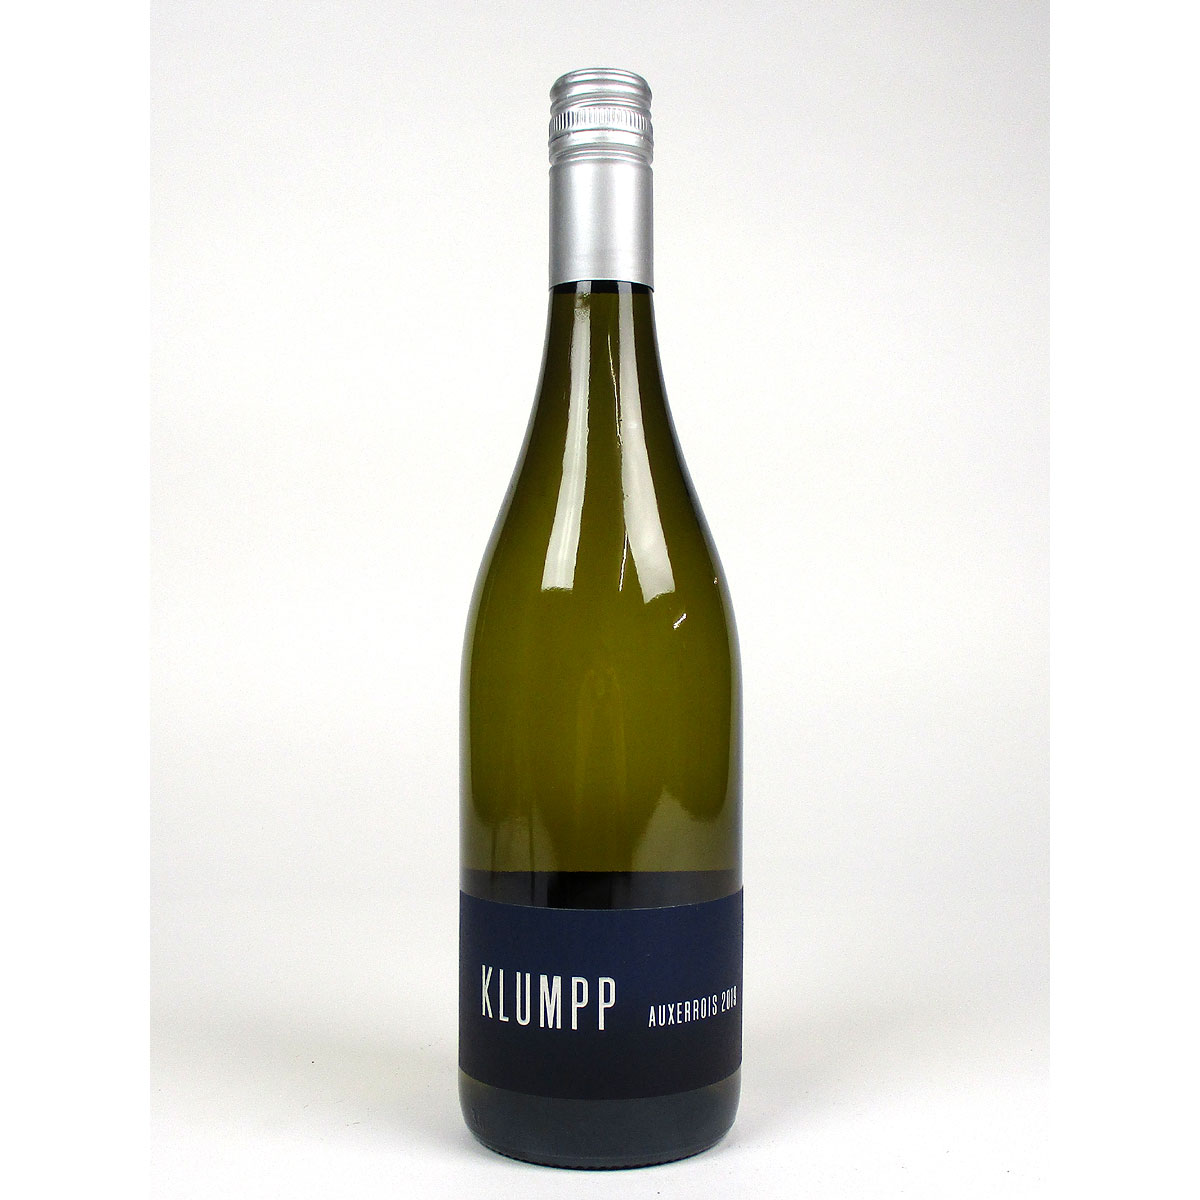 Baden: Klumpp Auxerrois 2019 - Bottle